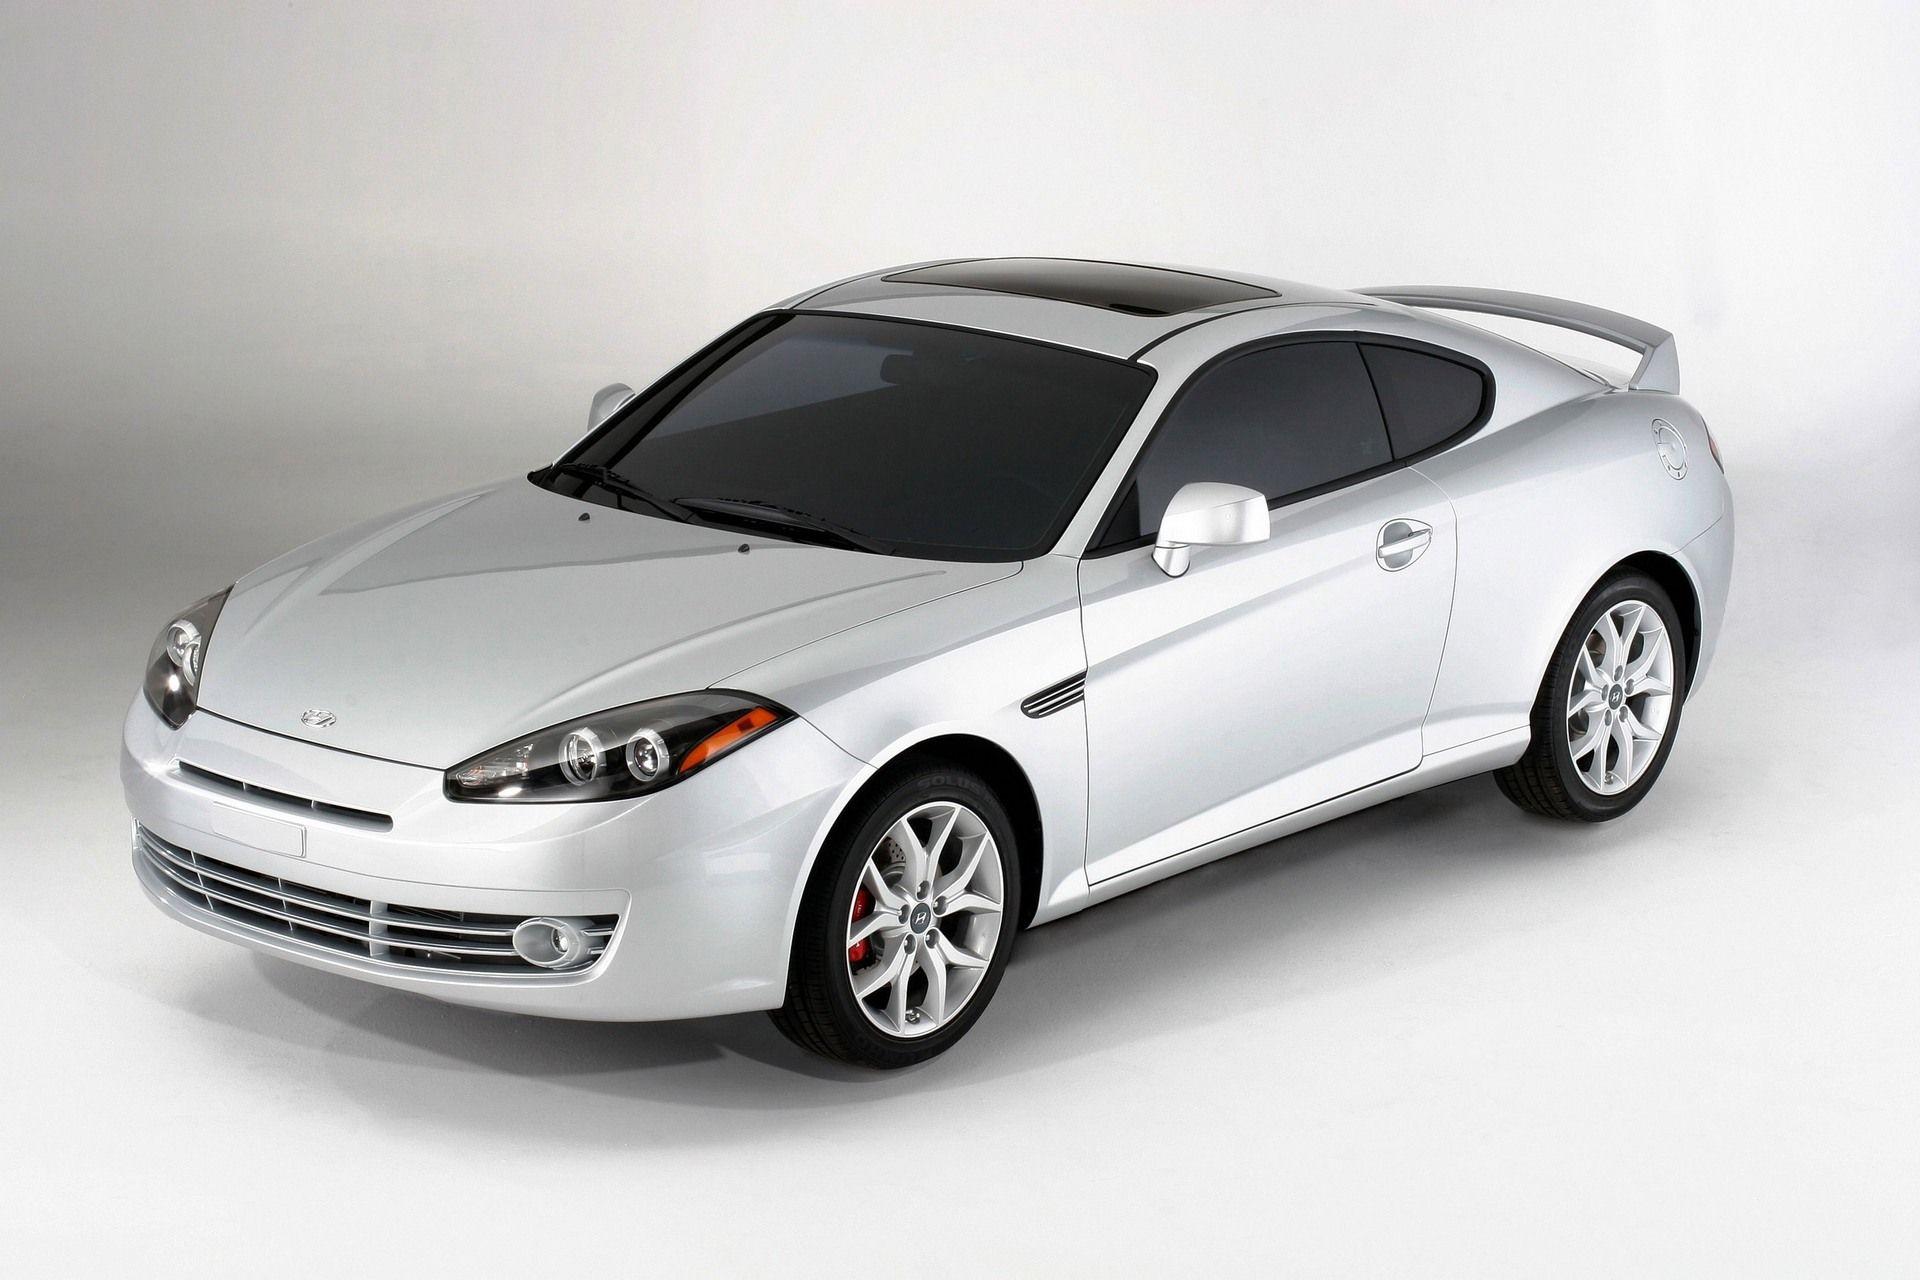 White Hyundai Tiburon 138 HP